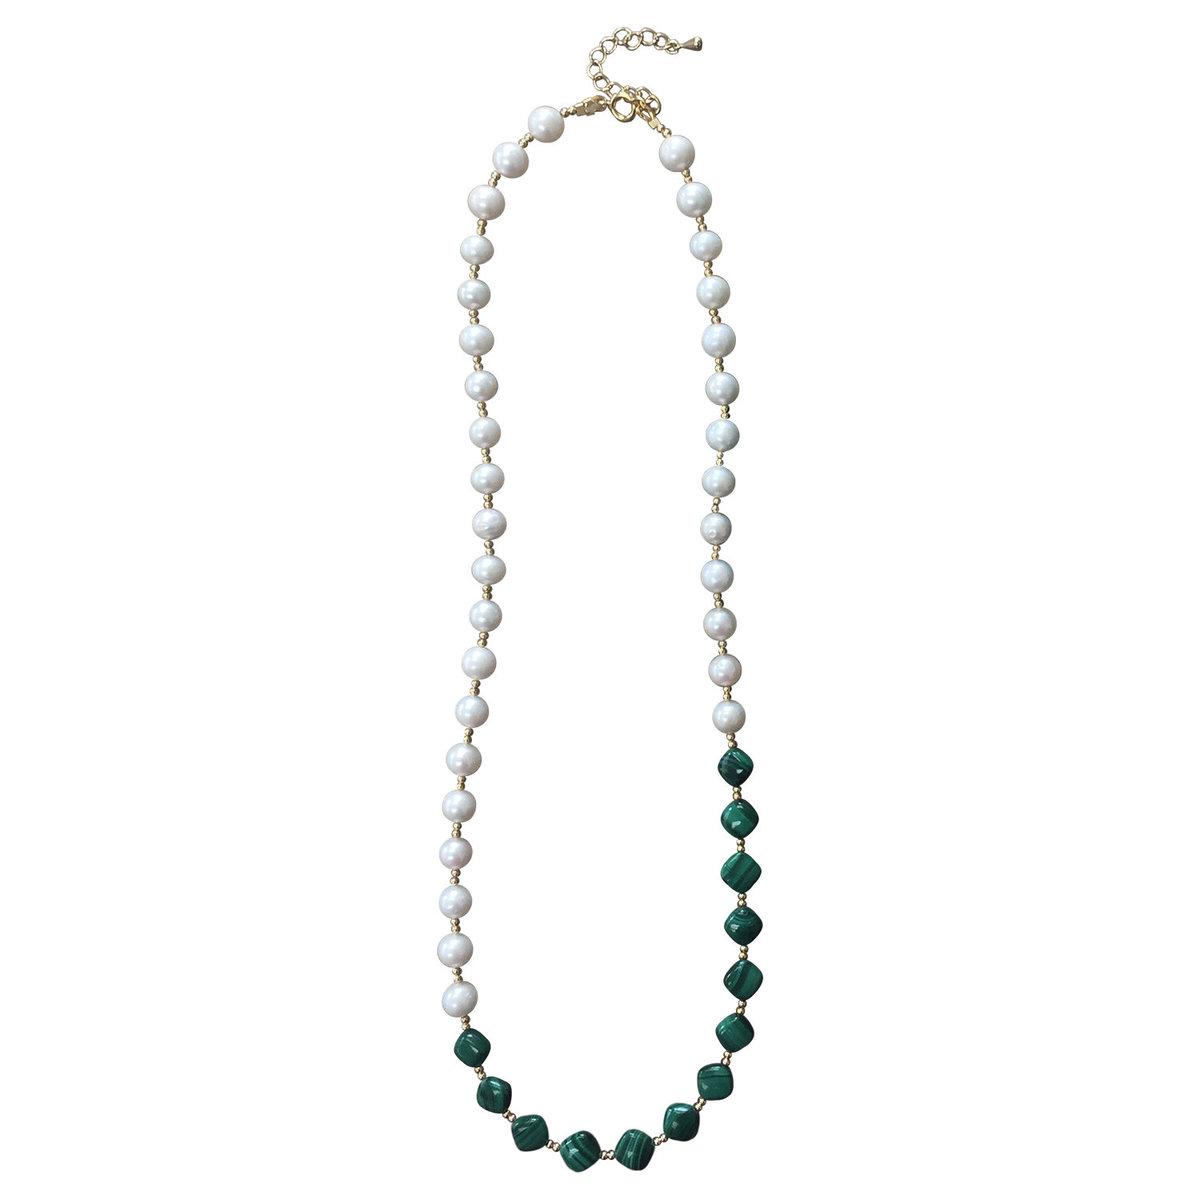 Natural freshwater pearls and malachite choker